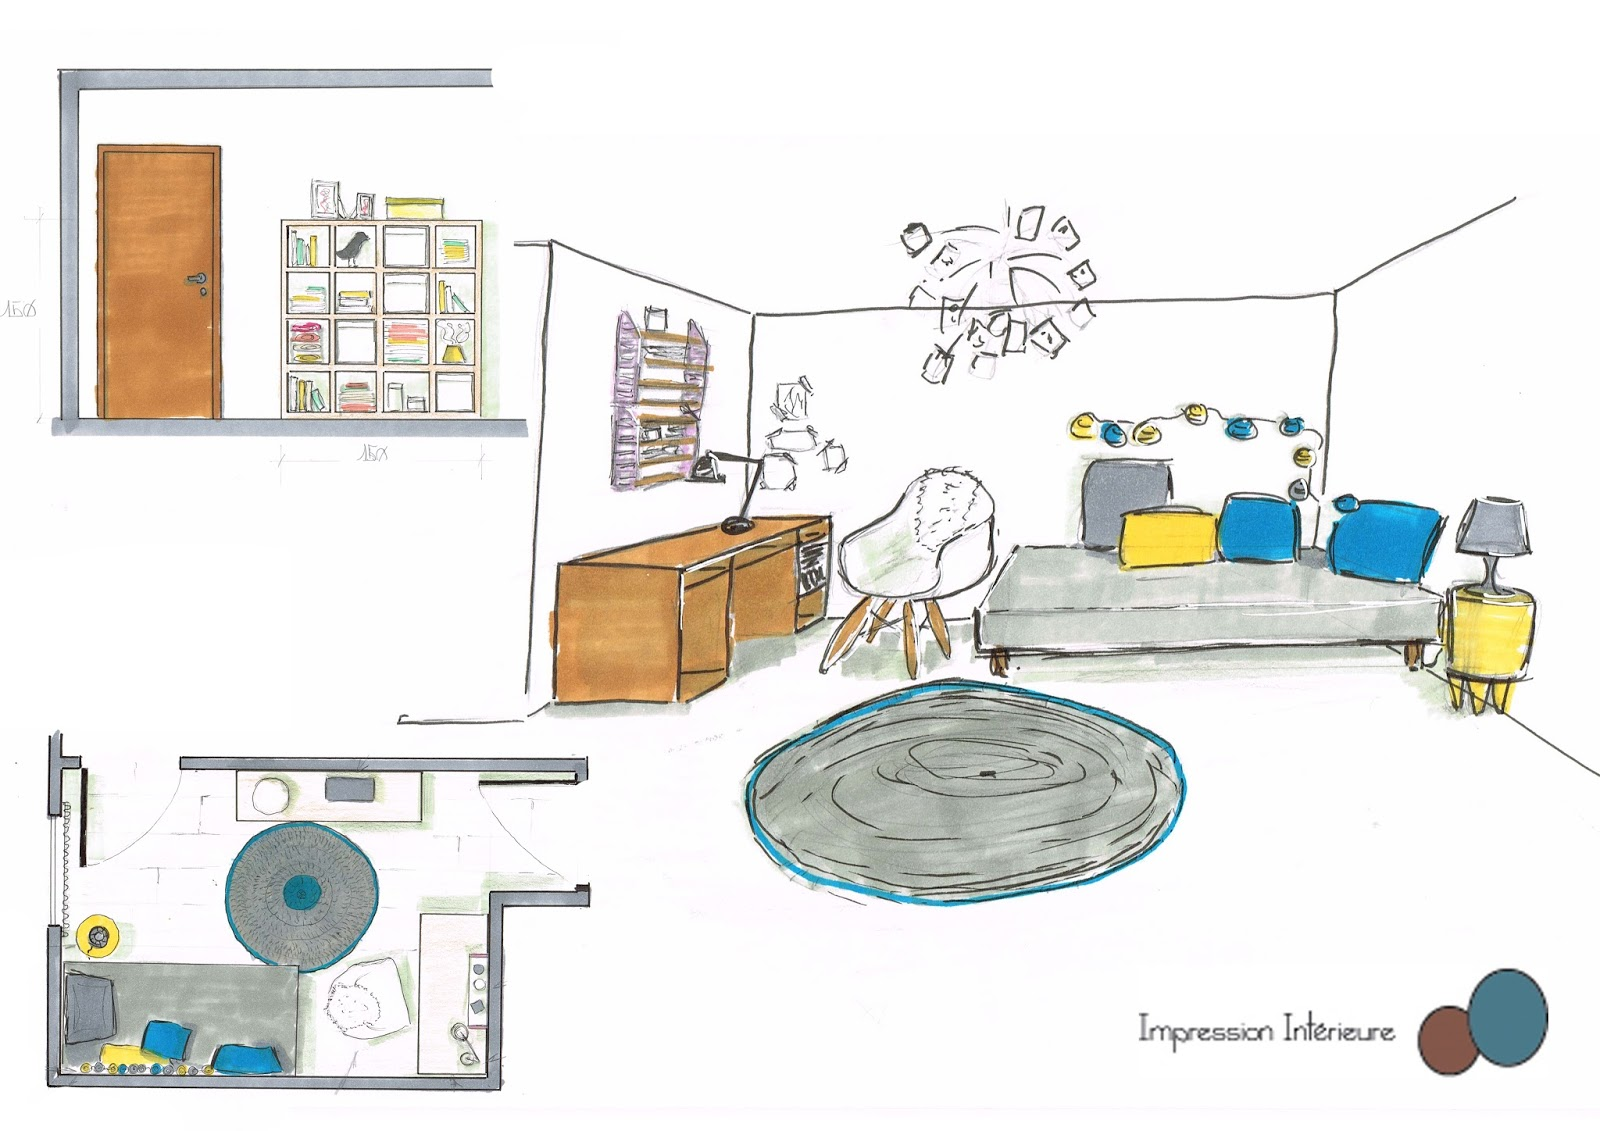 impression int rieure d coration d 39 un bureau chambre d 39 amis. Black Bedroom Furniture Sets. Home Design Ideas